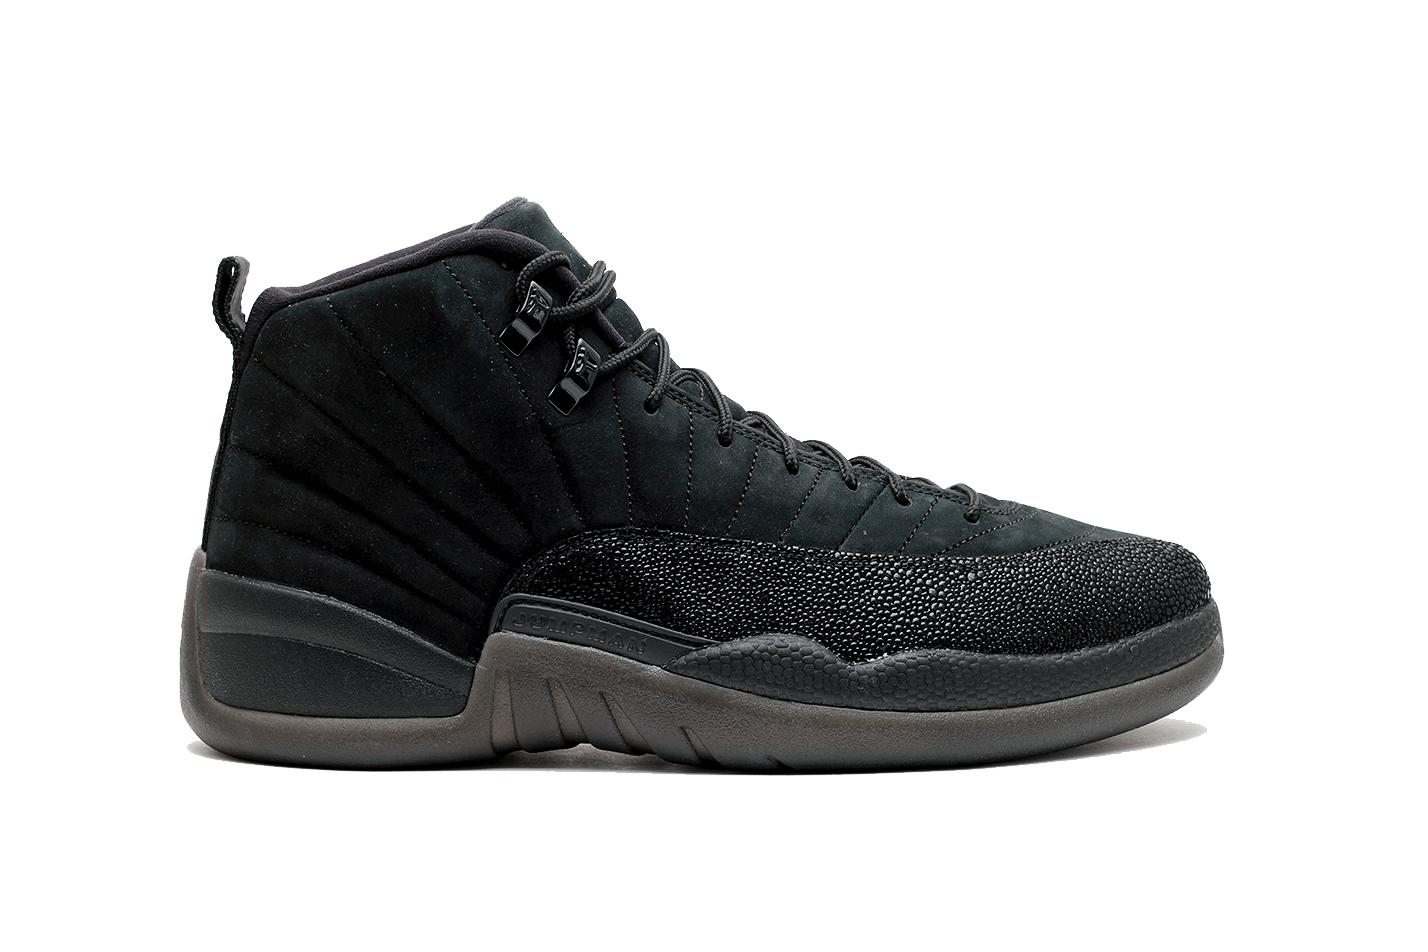 Jordan 12 ovo release date